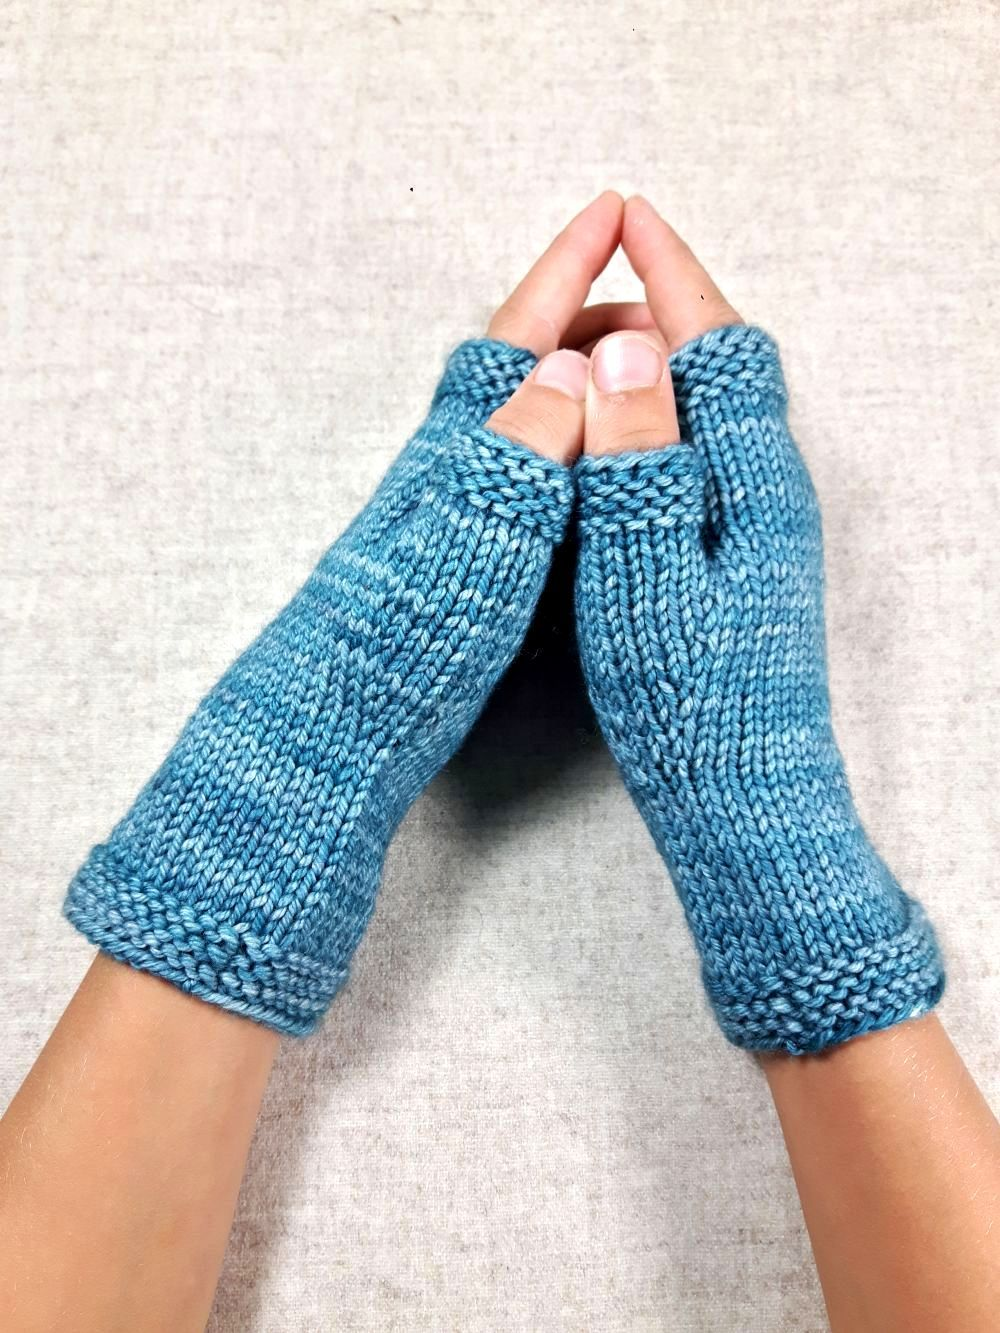 Handschuhe für Kinder, Petrol, ab 7 Jahre | Fingerhandschuhe, Petrol ...